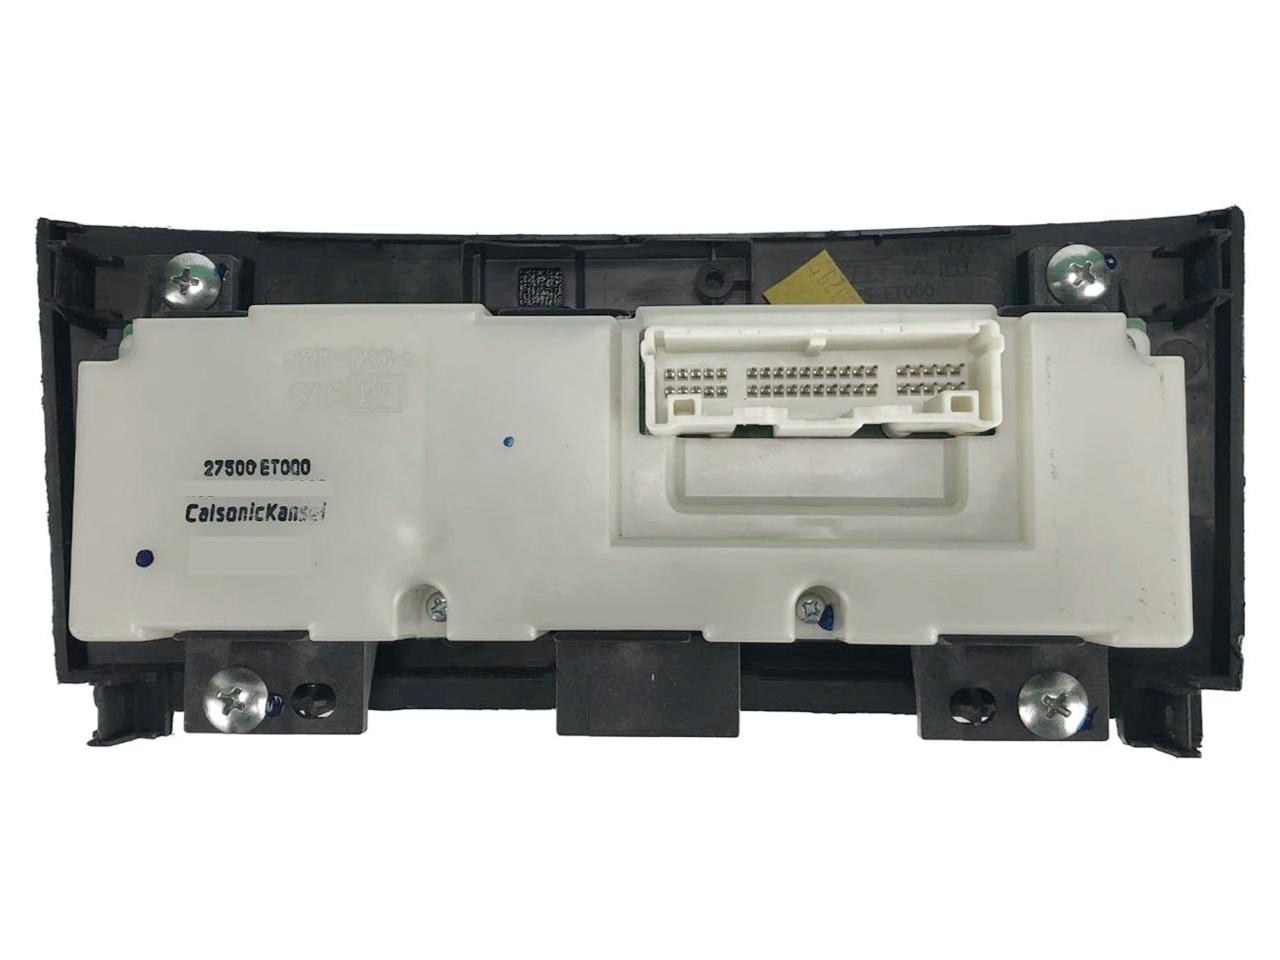 Comando Controle de Ar Condicionado do Painel Desembaçador Recirculador Direcionador Ar Quente Calsonic Kansei 27500et000 Nissan Sentra 08 09 010 011 012